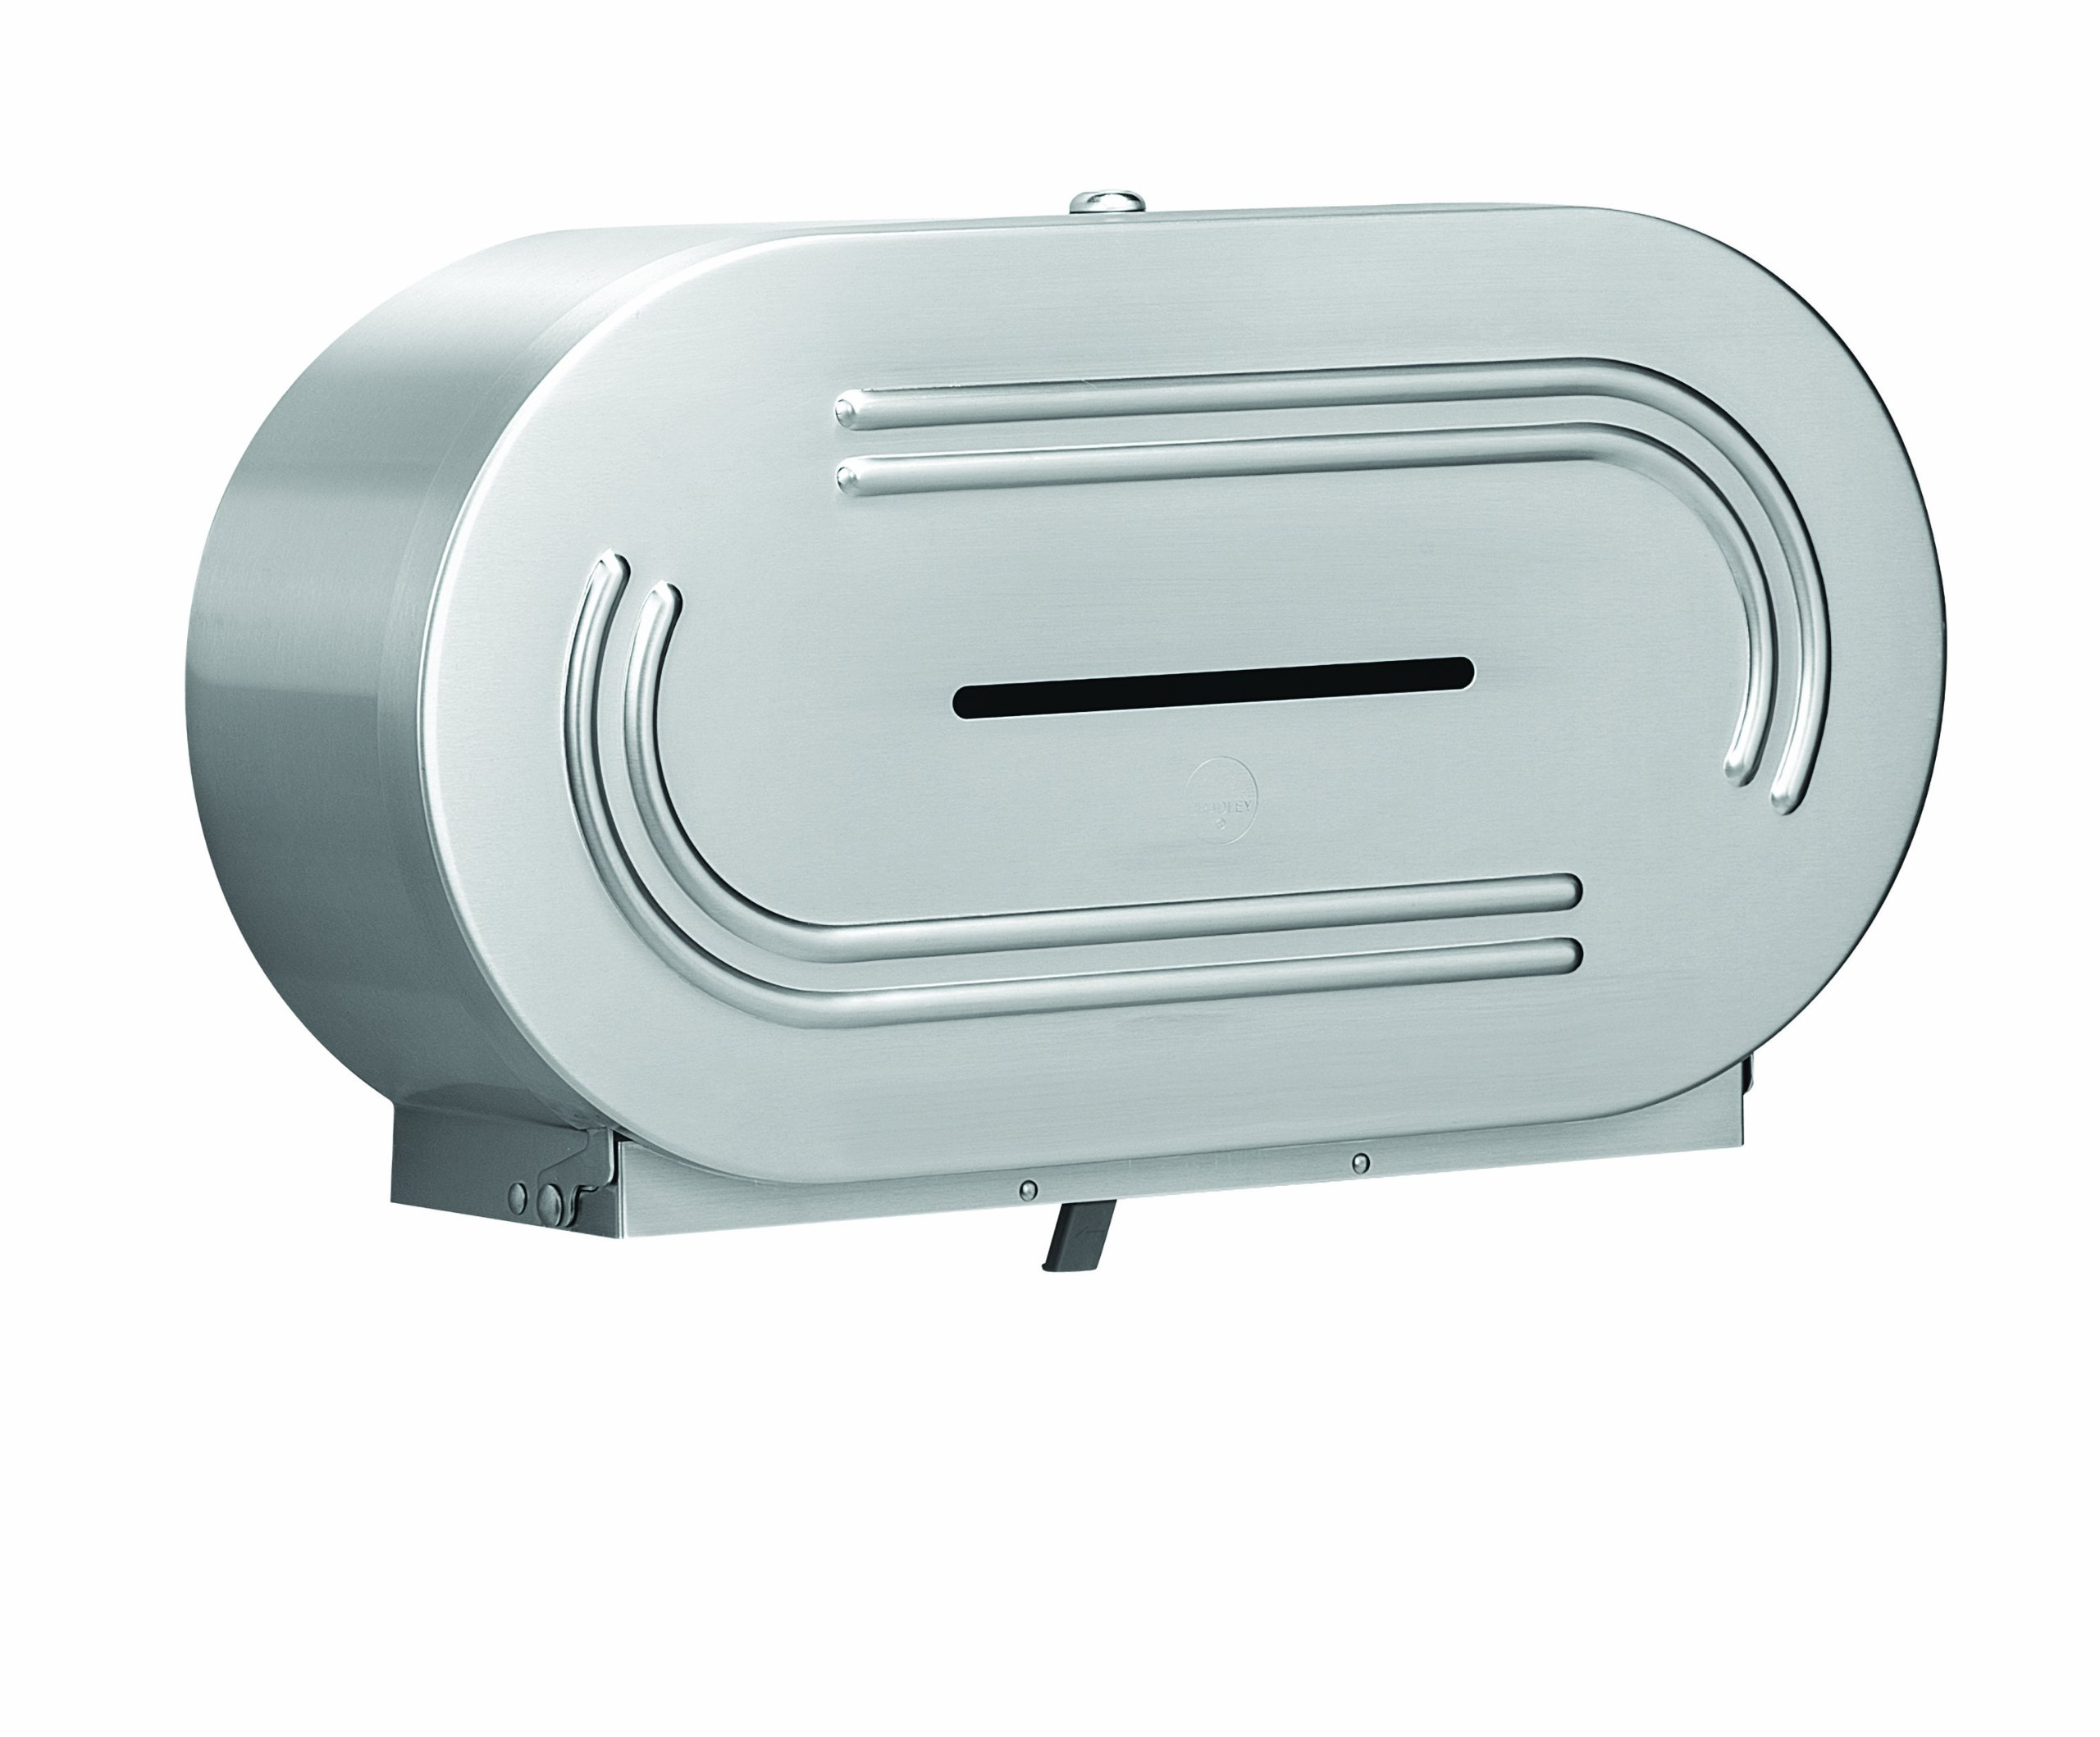 Bradley 5425-000000 18 Gauge Stainless Steel Jumbo Dual Roll Toilet Tissue Dispenser, 20-9/16'' Width x 11-3/8'' Height x 6'' Depth by Bradley (Image #1)